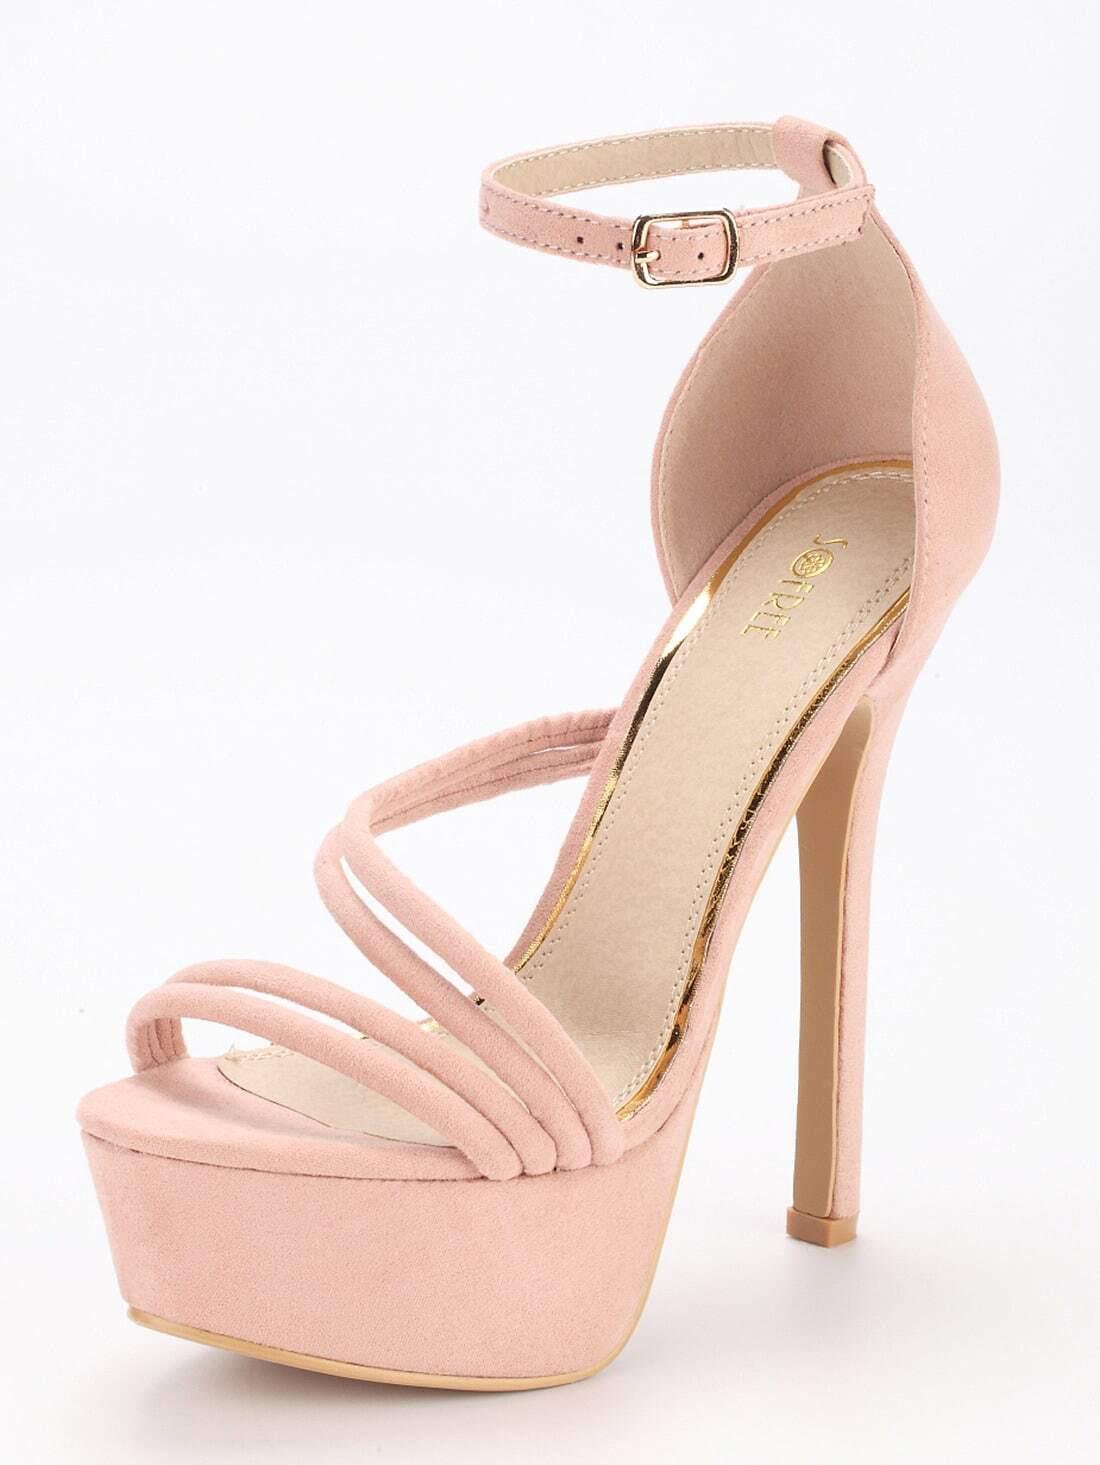 high heel shoe chair value city mat for hardwood floor staples pink strap platform sandals shein sheinside